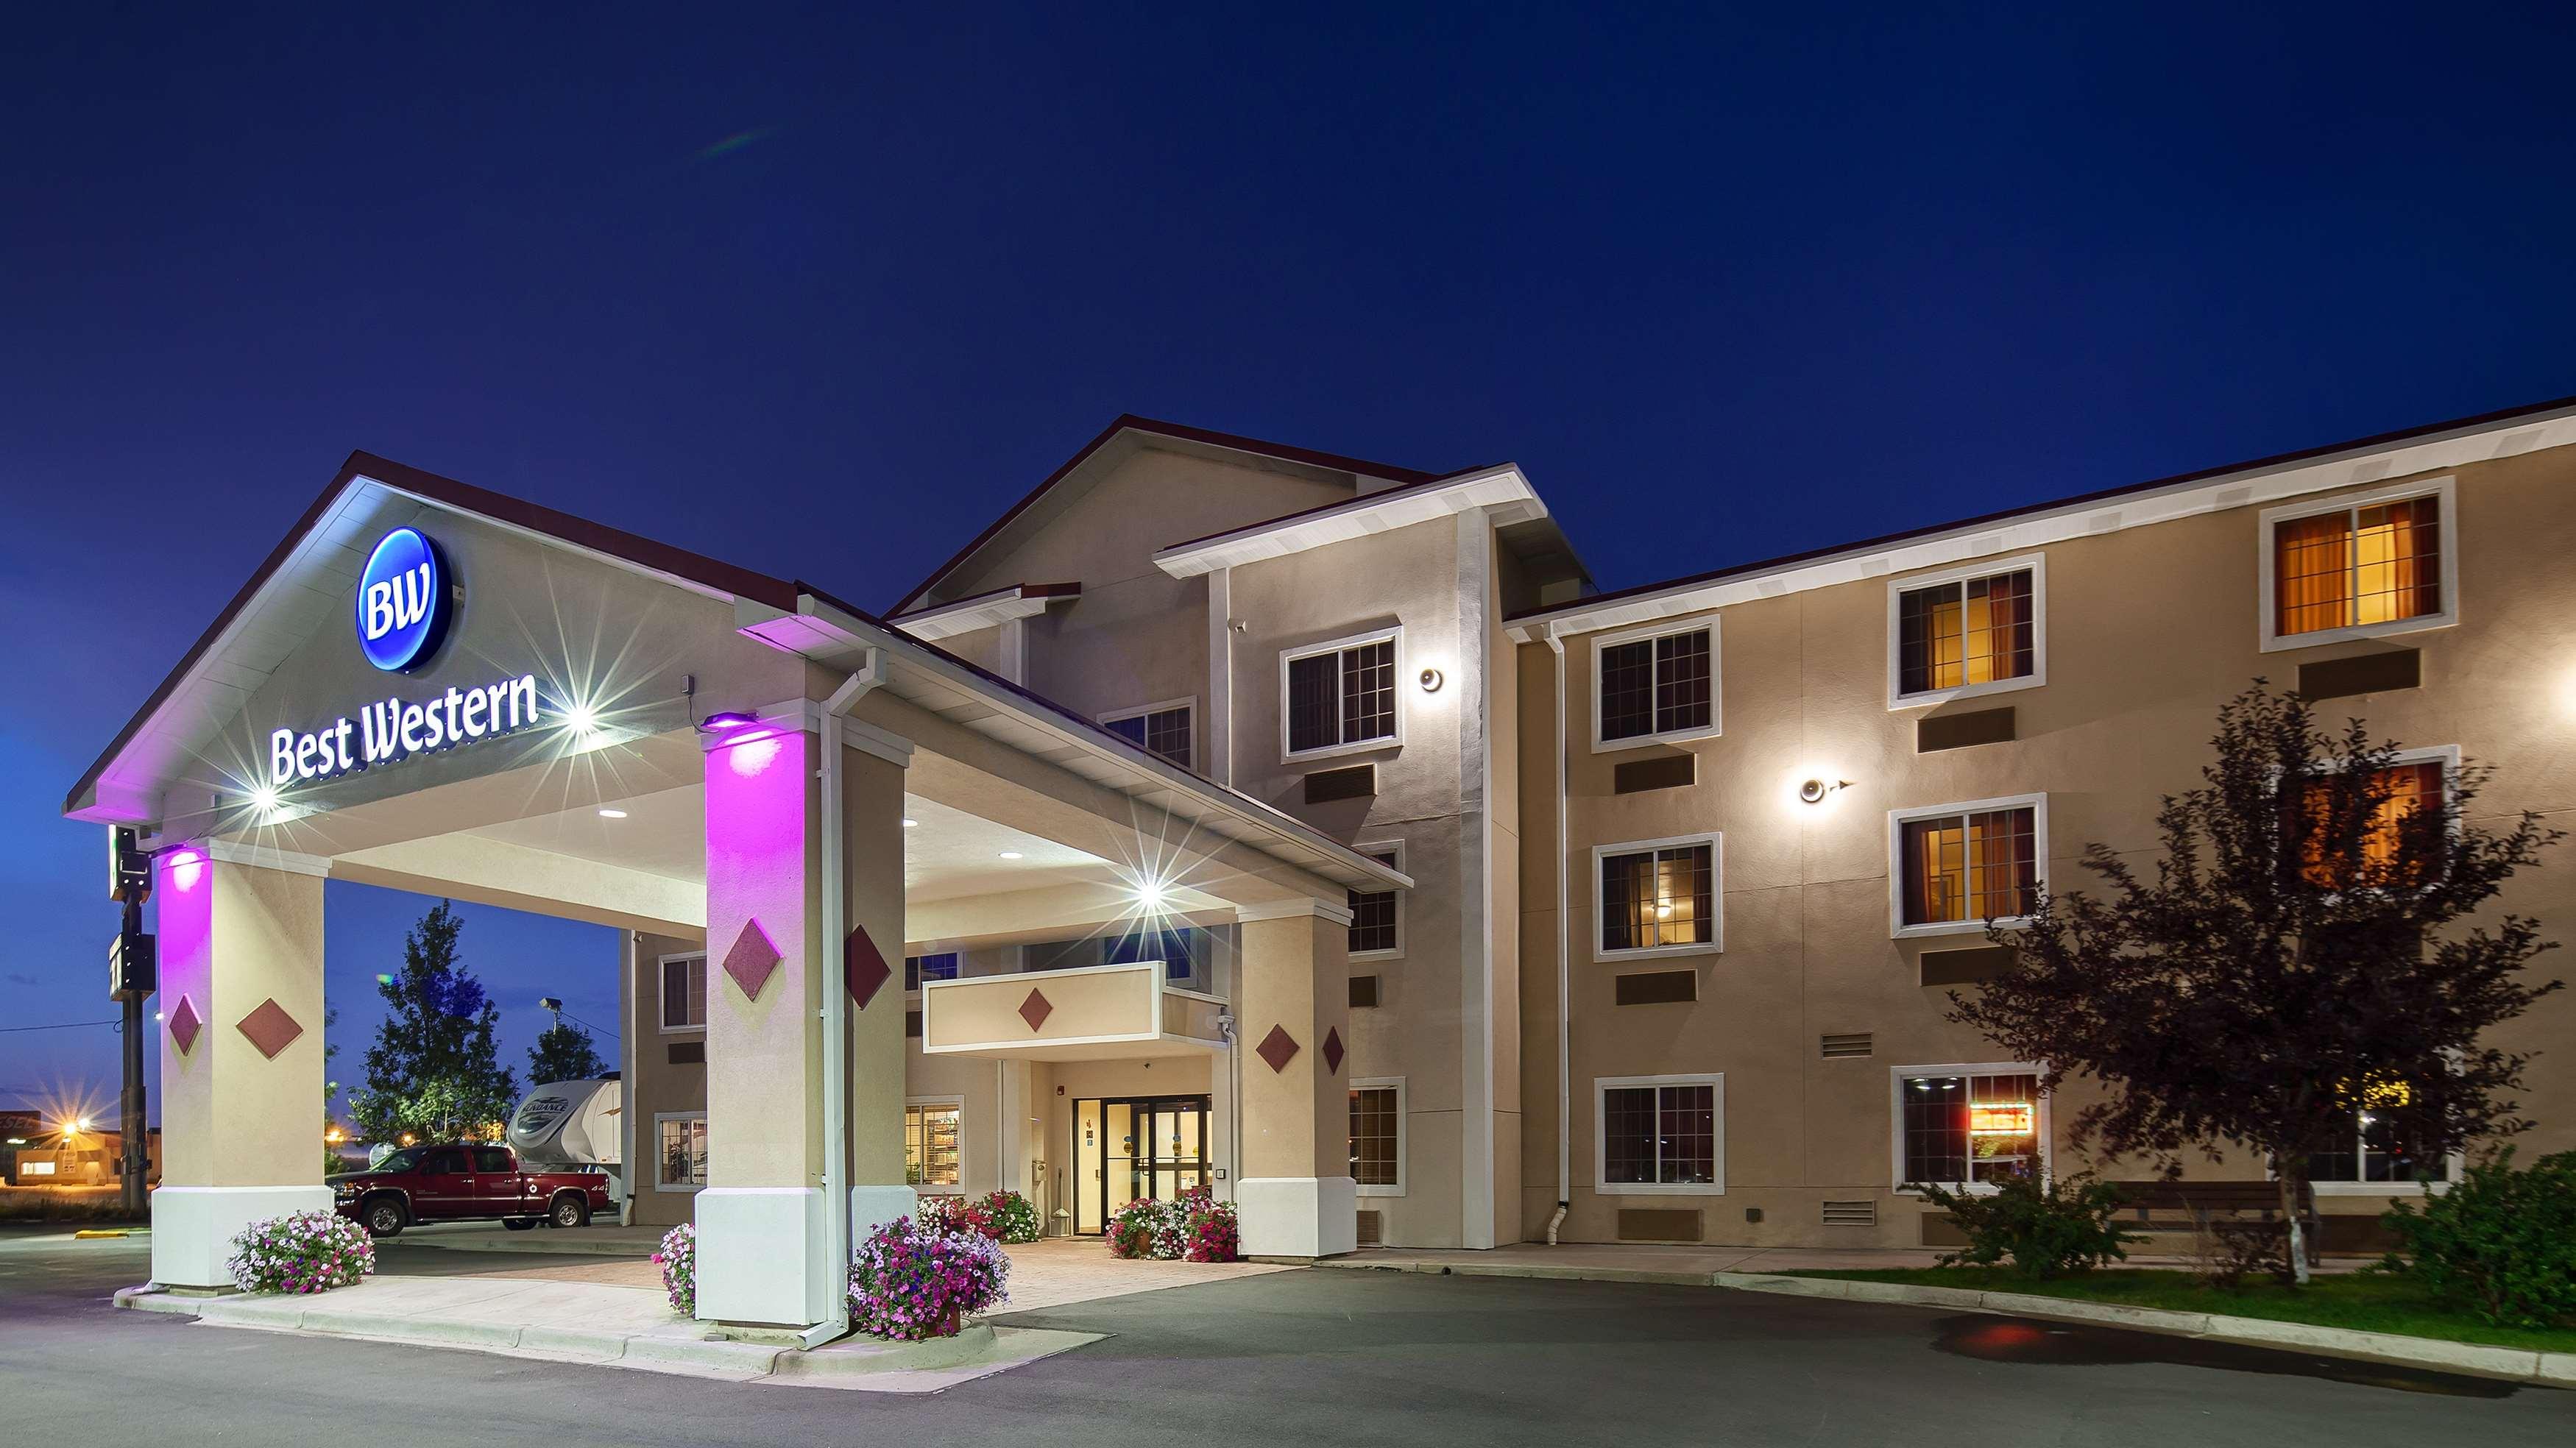 Best Western Laramie Inn & Suites in Laramie, WY - (307 ...